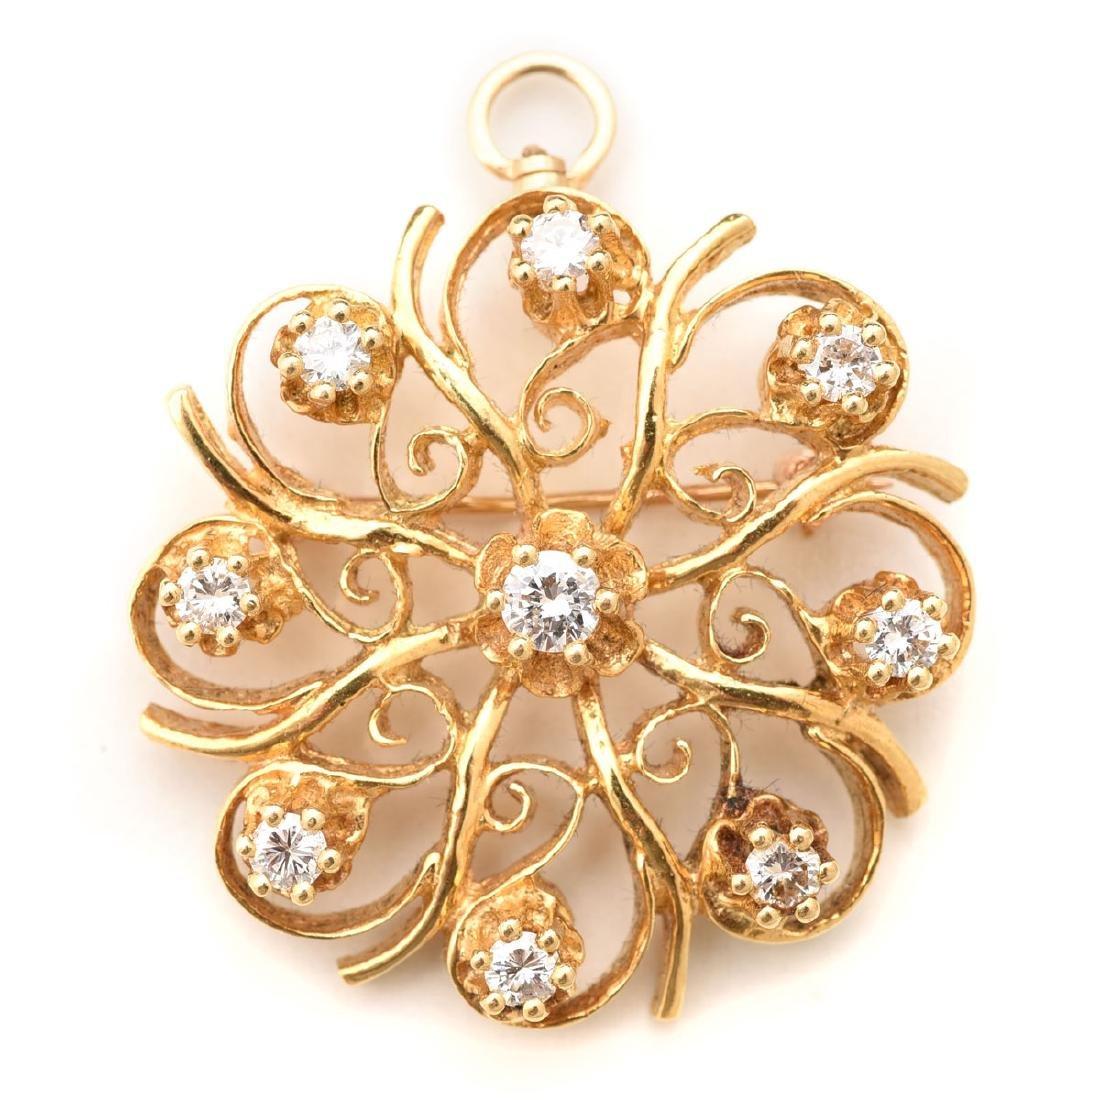 Diamond, 18k Yellow Gold Pendant Brooch.